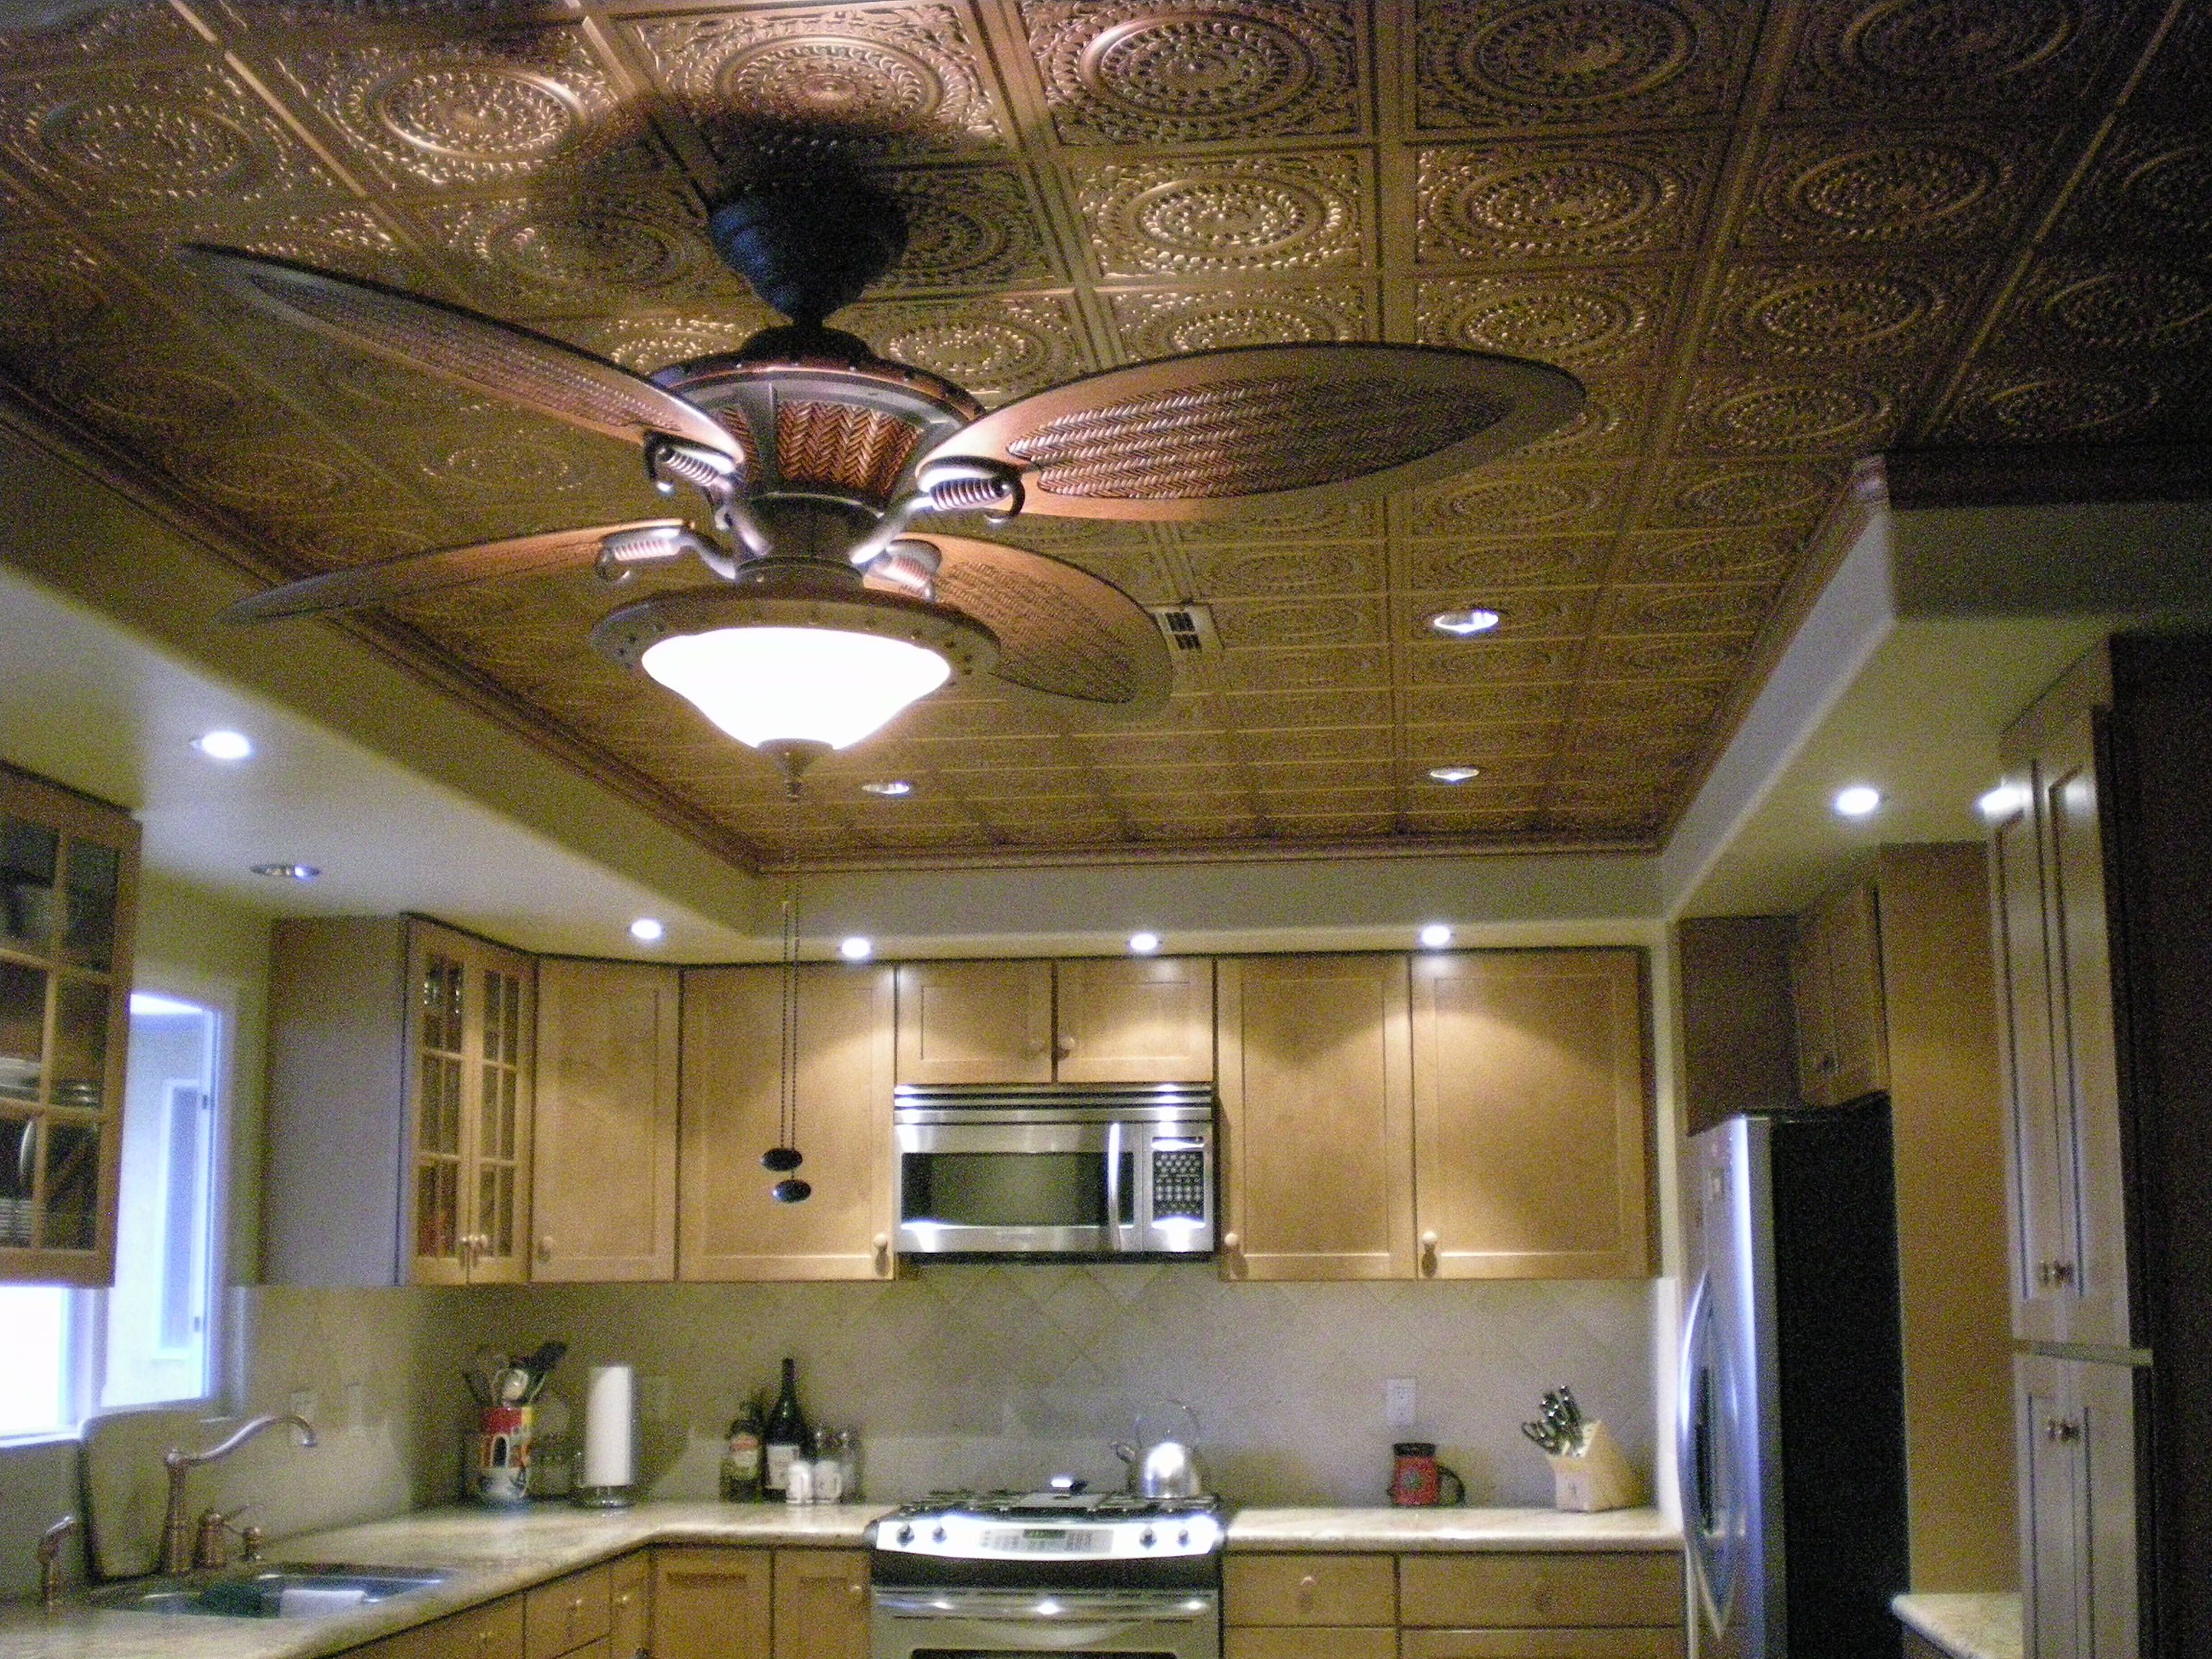 Pvc Faux Tin Ceiling Tiles Ceilings Walls Backsplash Photo